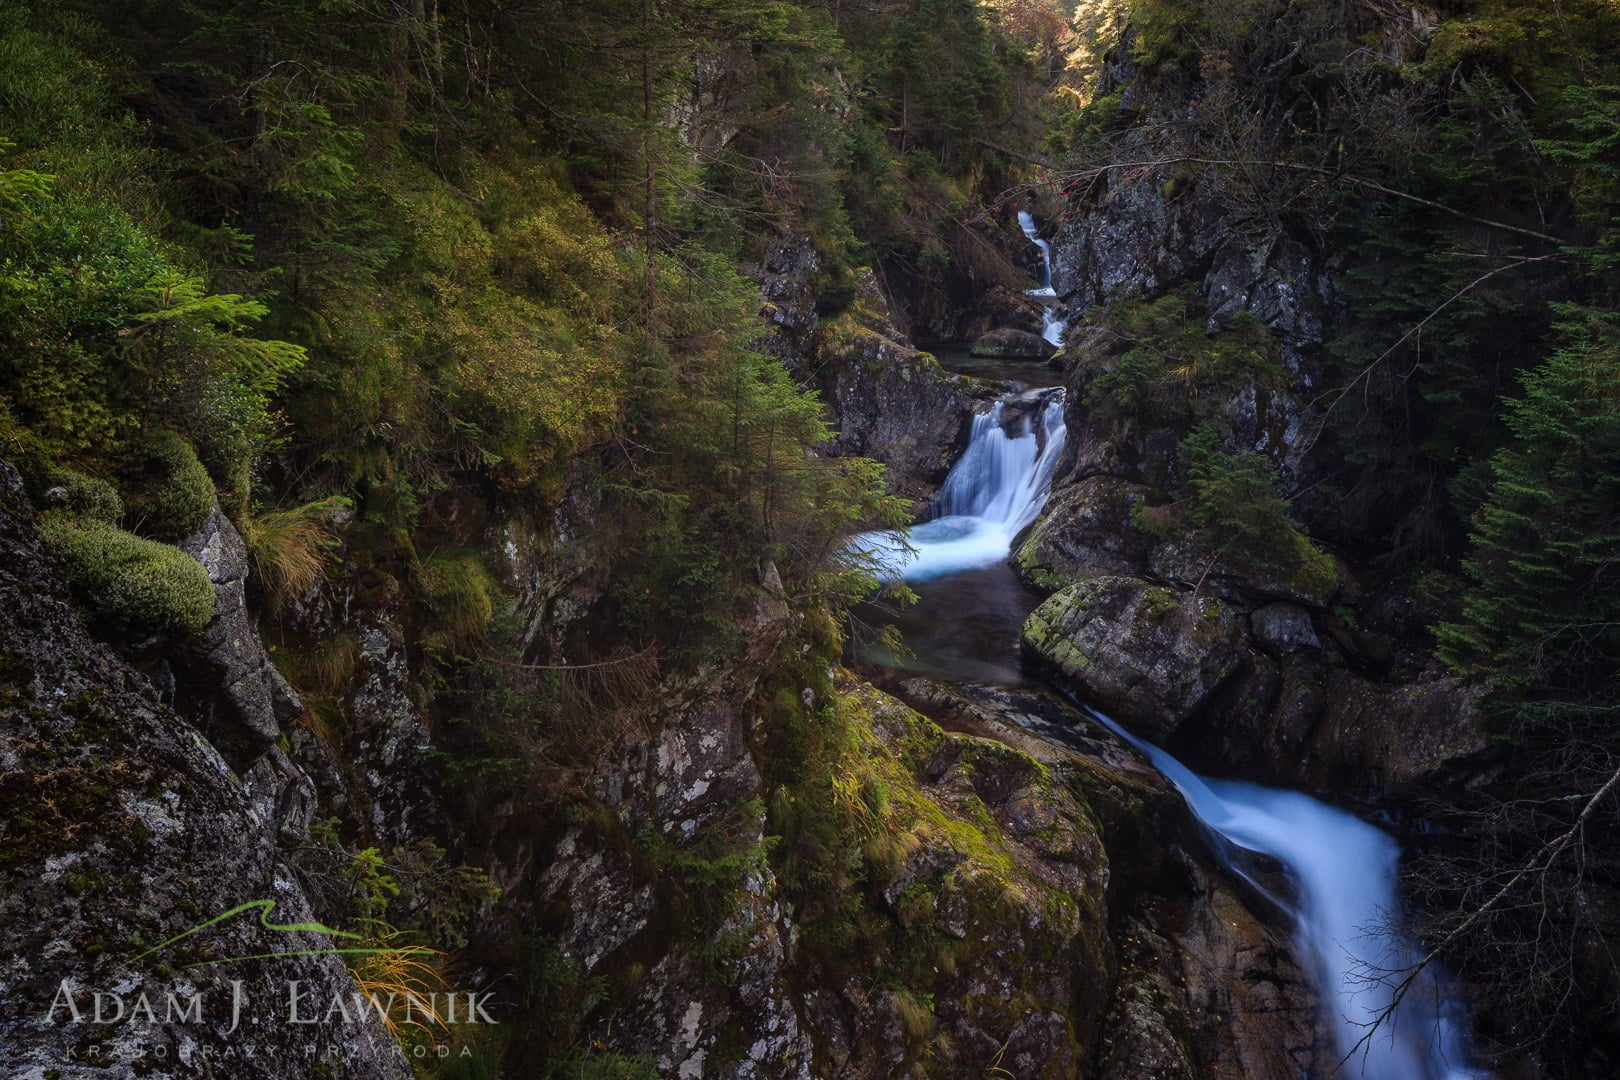 Tatra National Park, Poland 1310-01295C